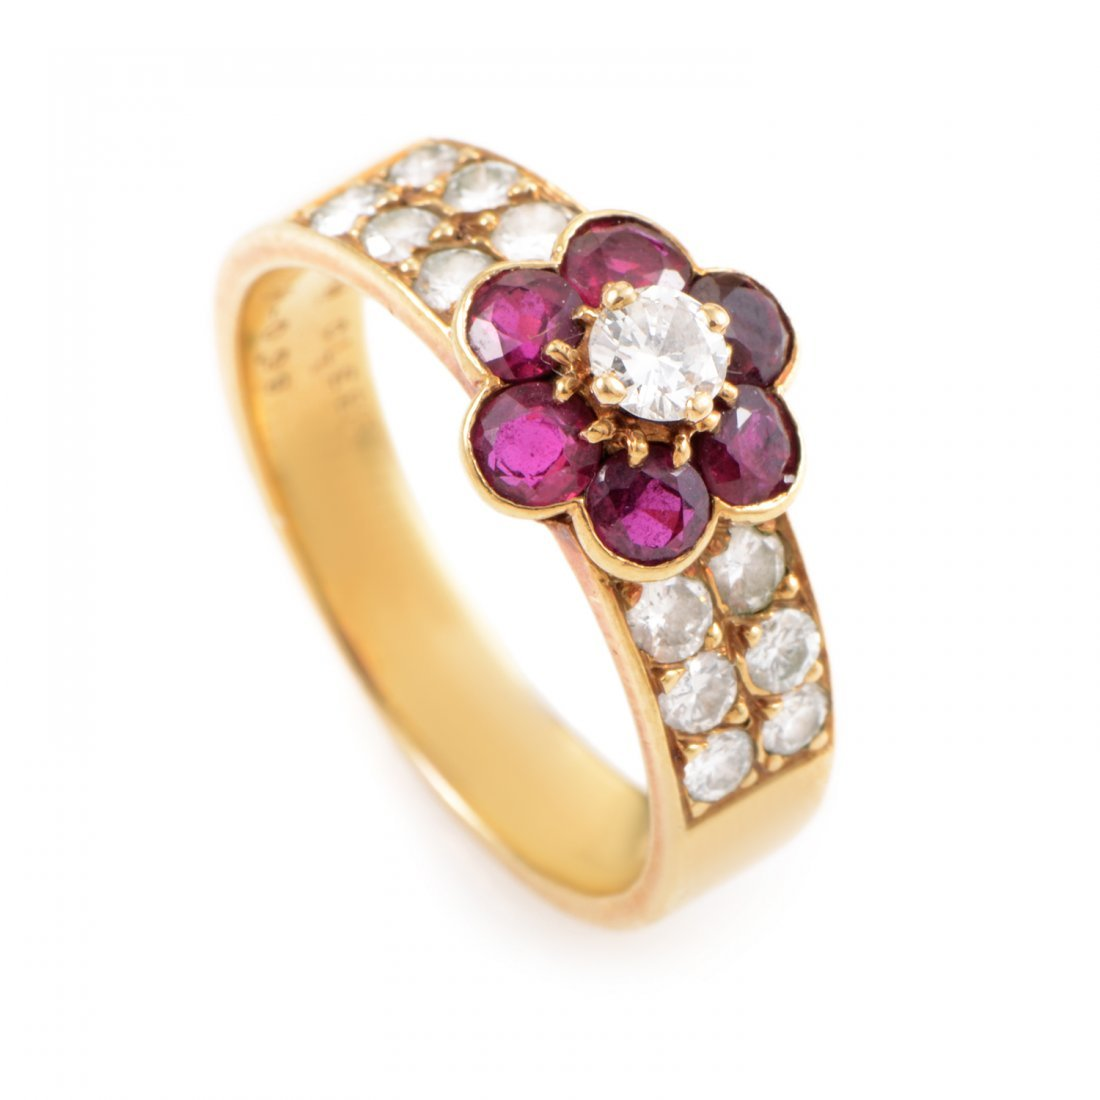 Van Cleef & Arpels 18K Yellow Gold Diamond & Ruby